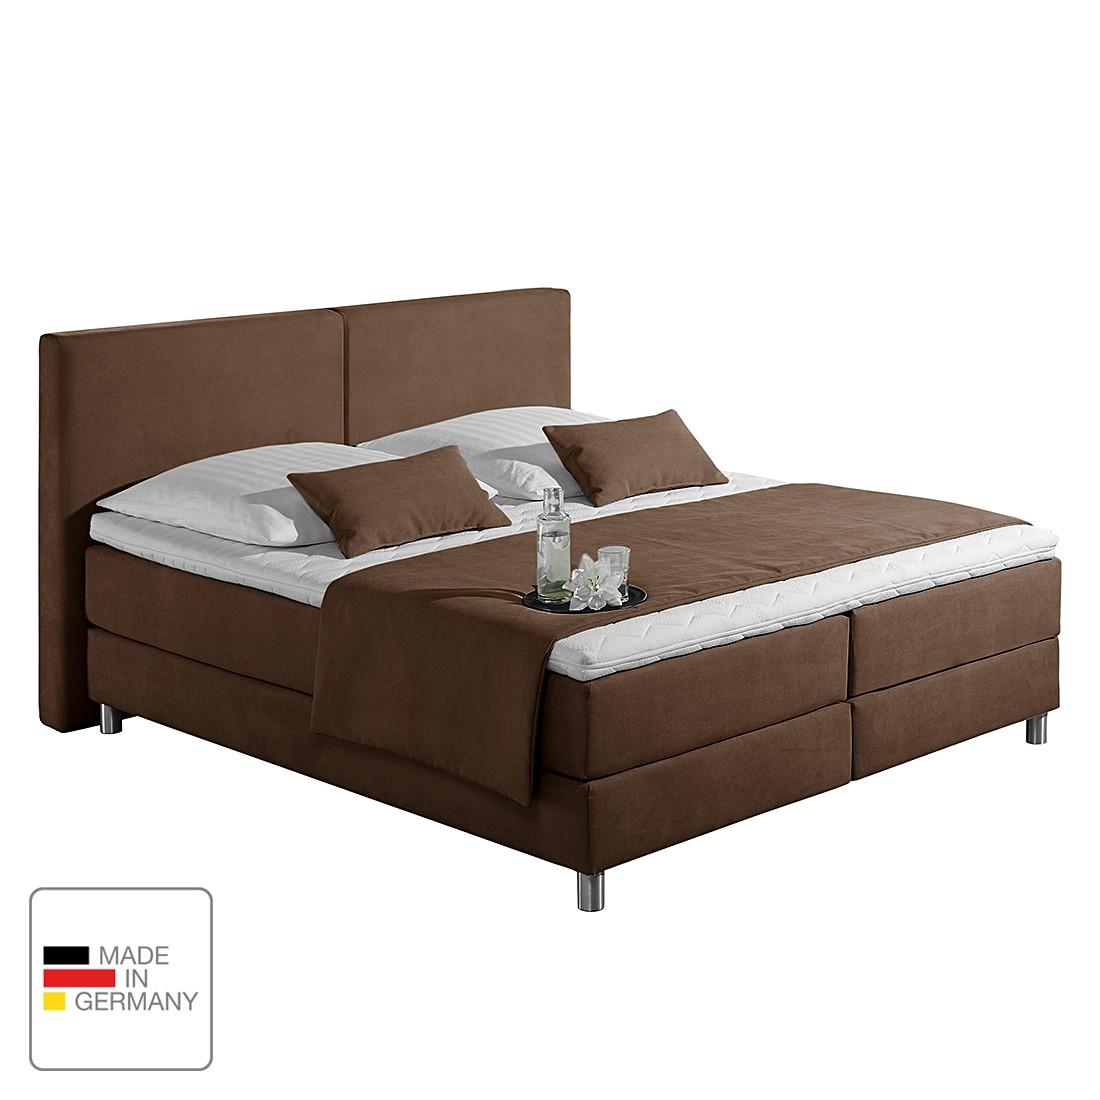 Boxspringbett Nilan - Webstoff - 180 x 200cm - H3 ab 80 kg - Bonellfederkernmatratze - Schokoladenbraun, Monaco